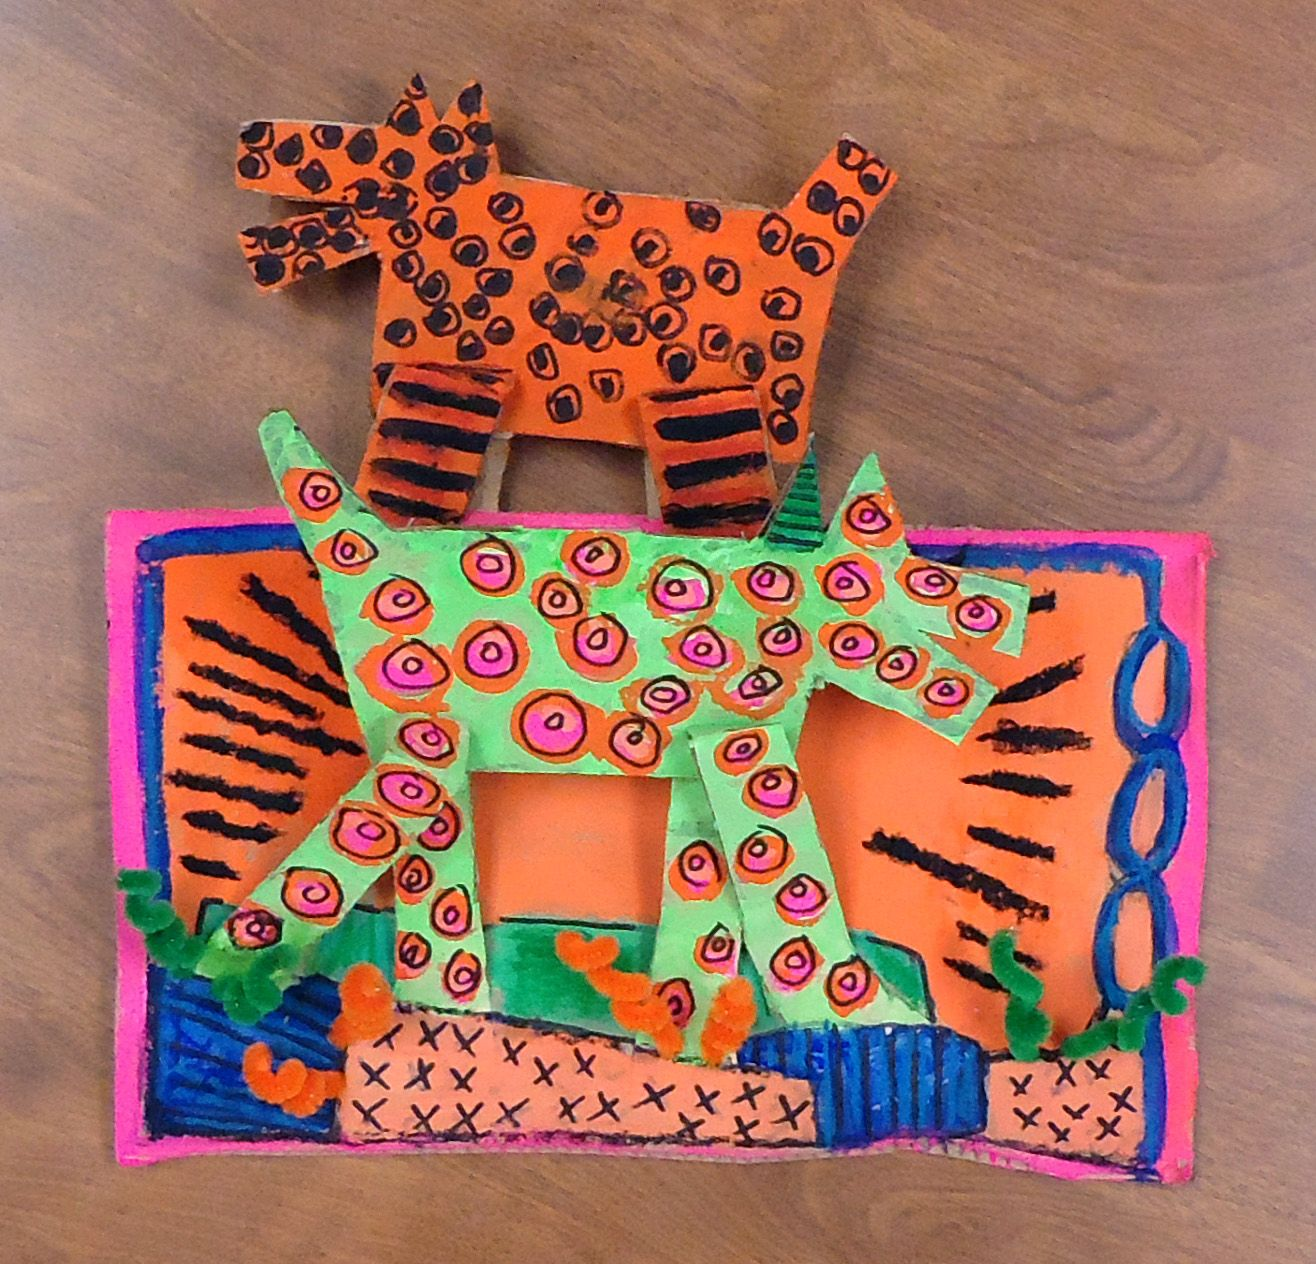 Keith Haring Cardboard Relief